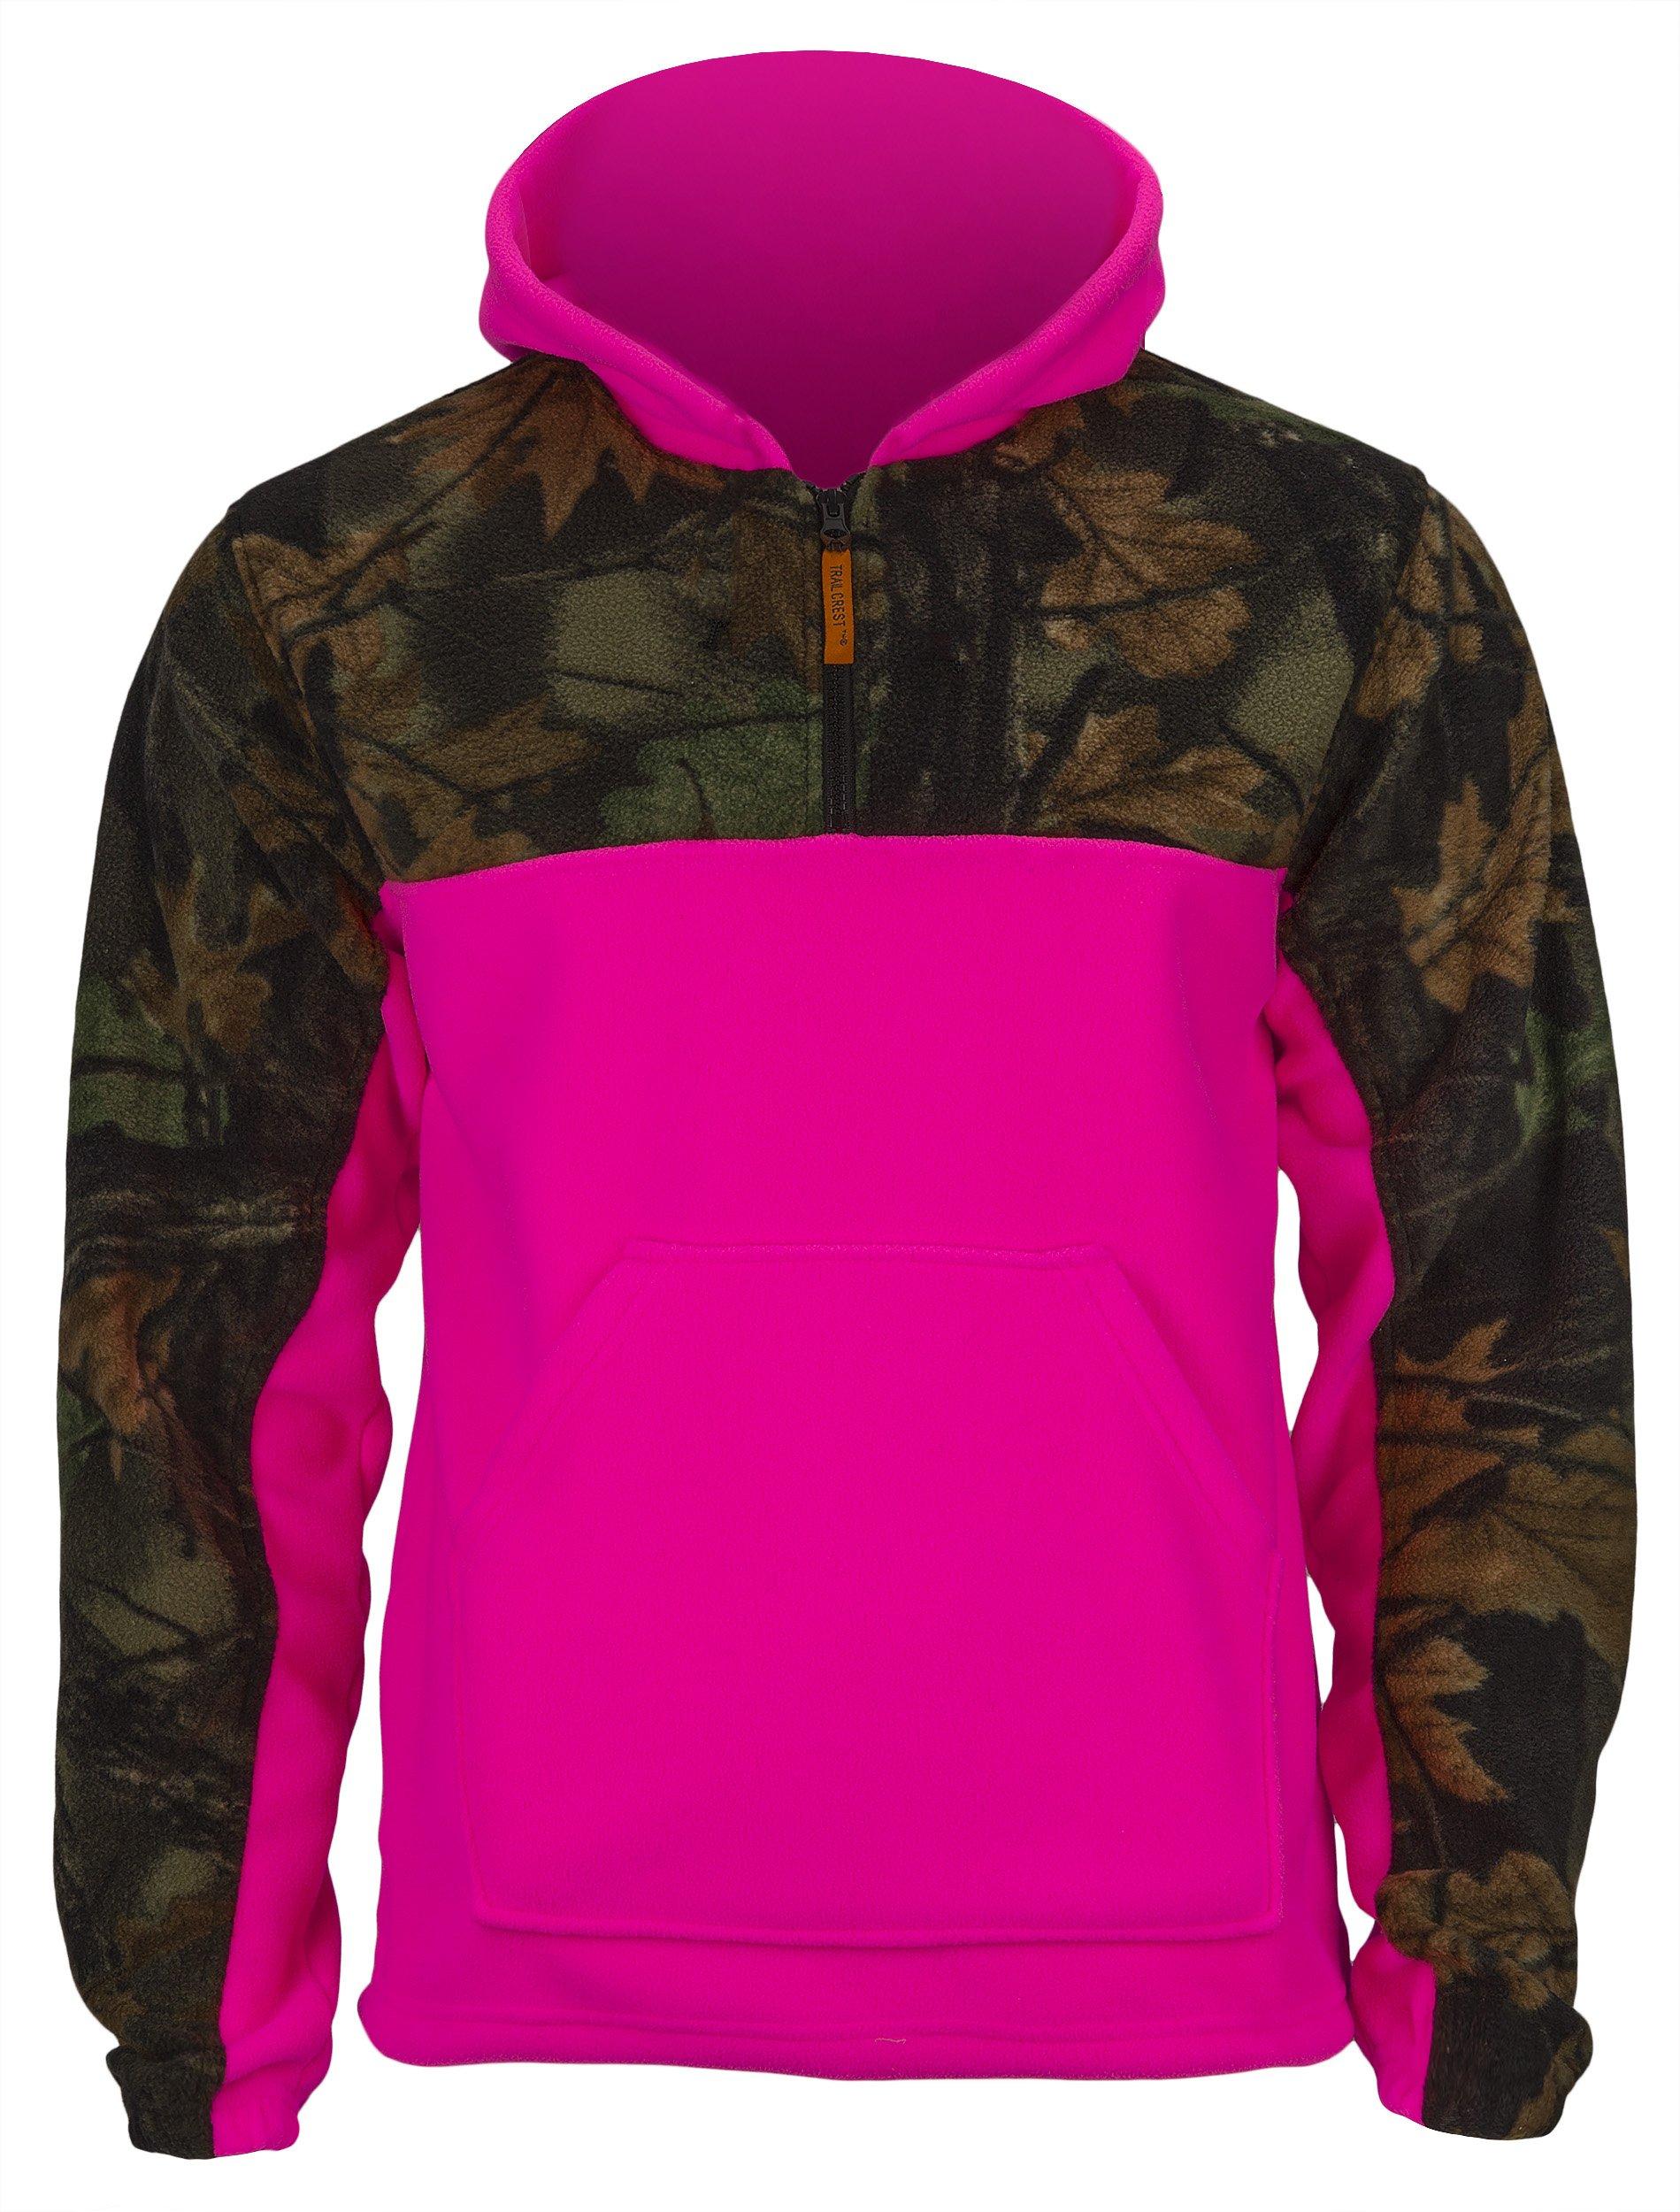 TrailCrest Girls Camo Fleece Hunting Camouflage 1/4 Zip Hooded Sweatshirt (Large, Camo/Rose)